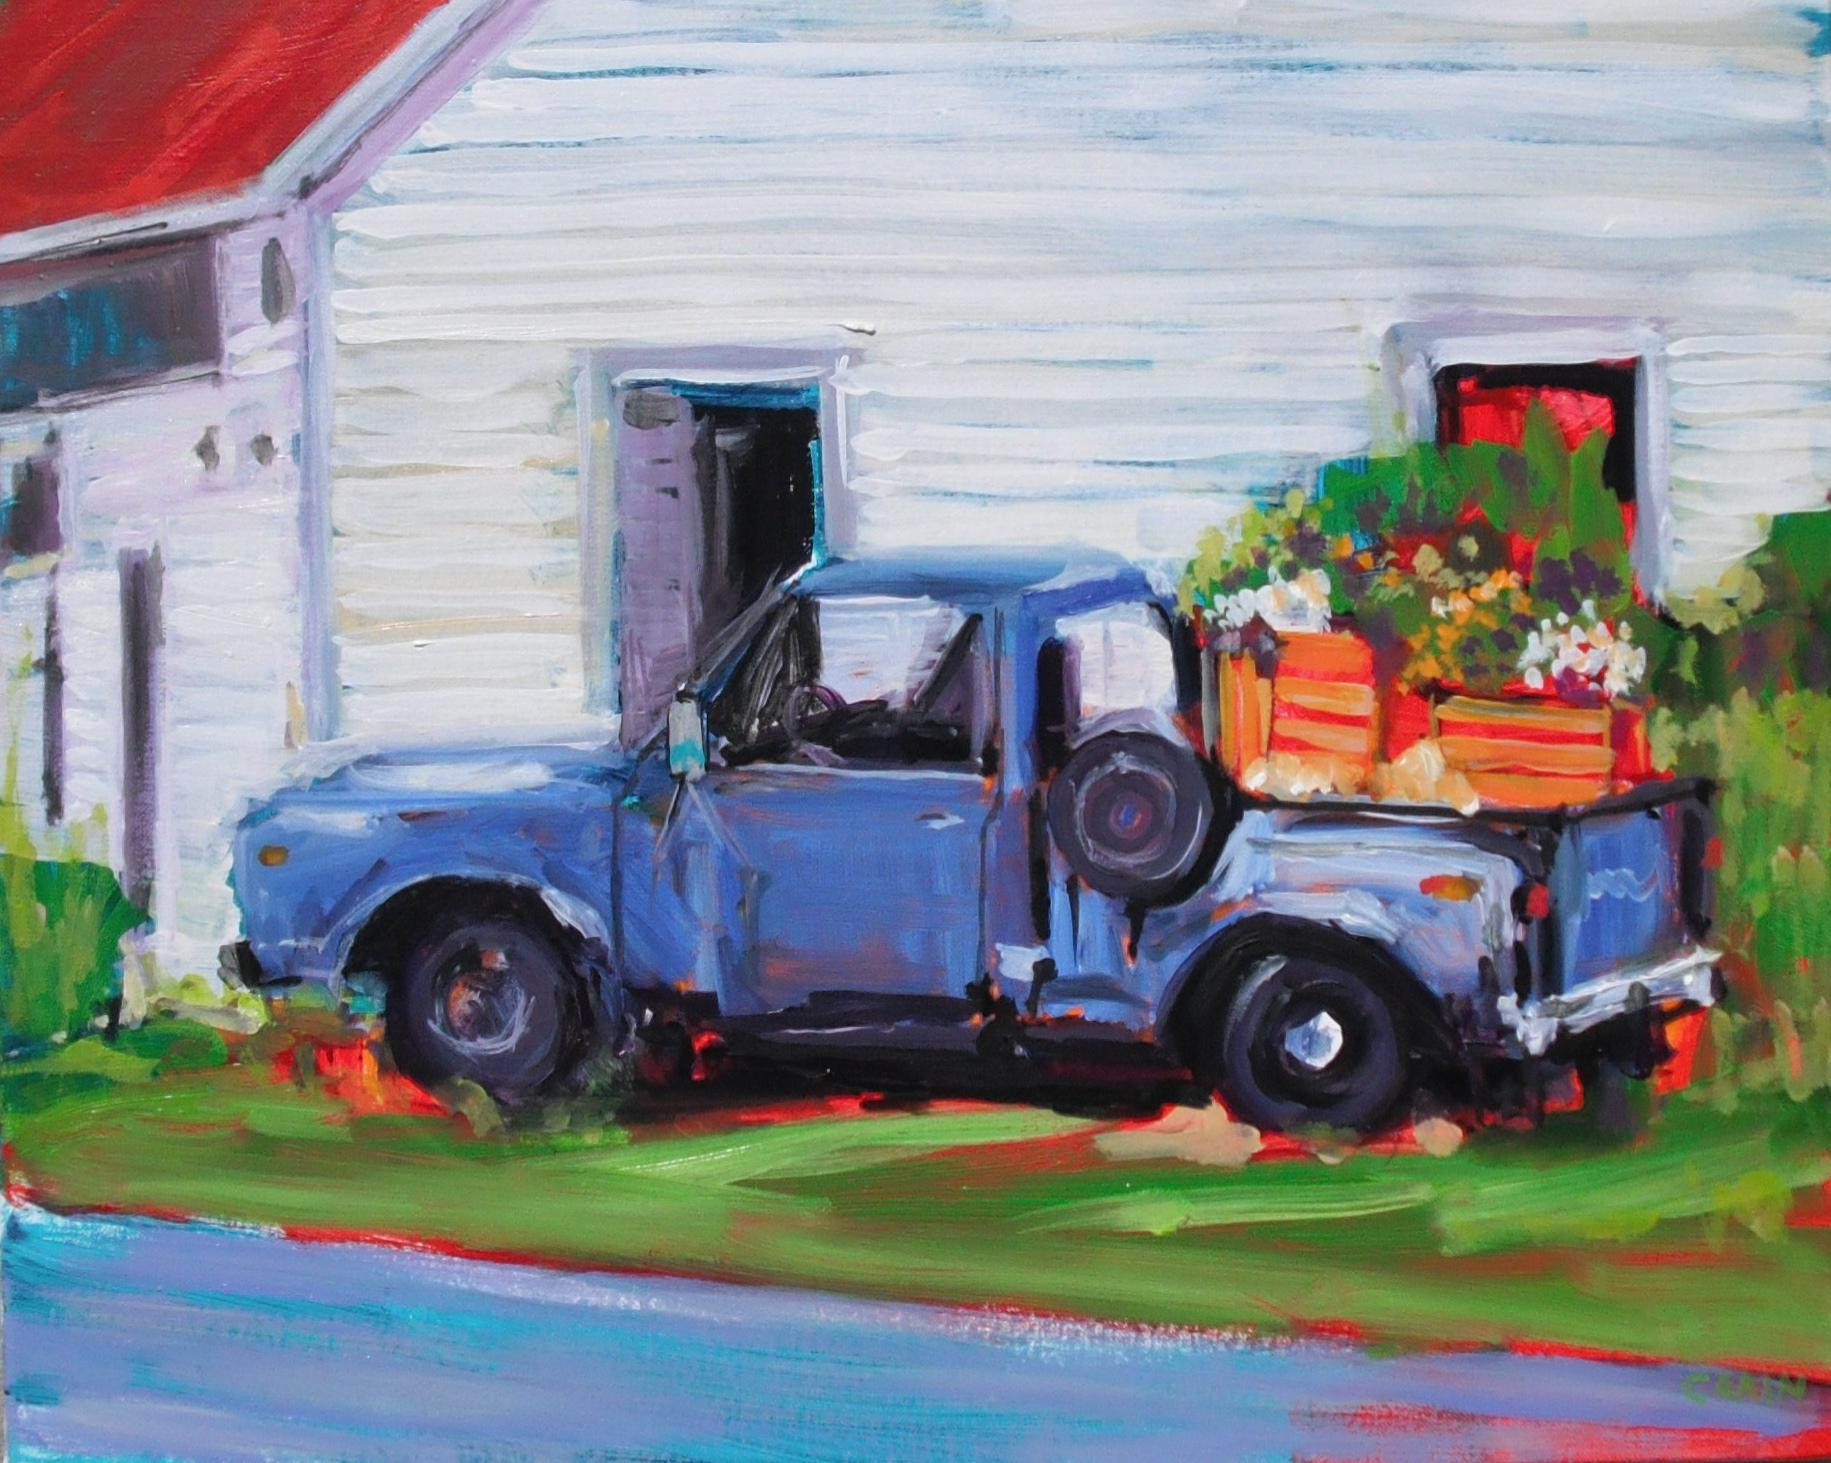 Gus's truck